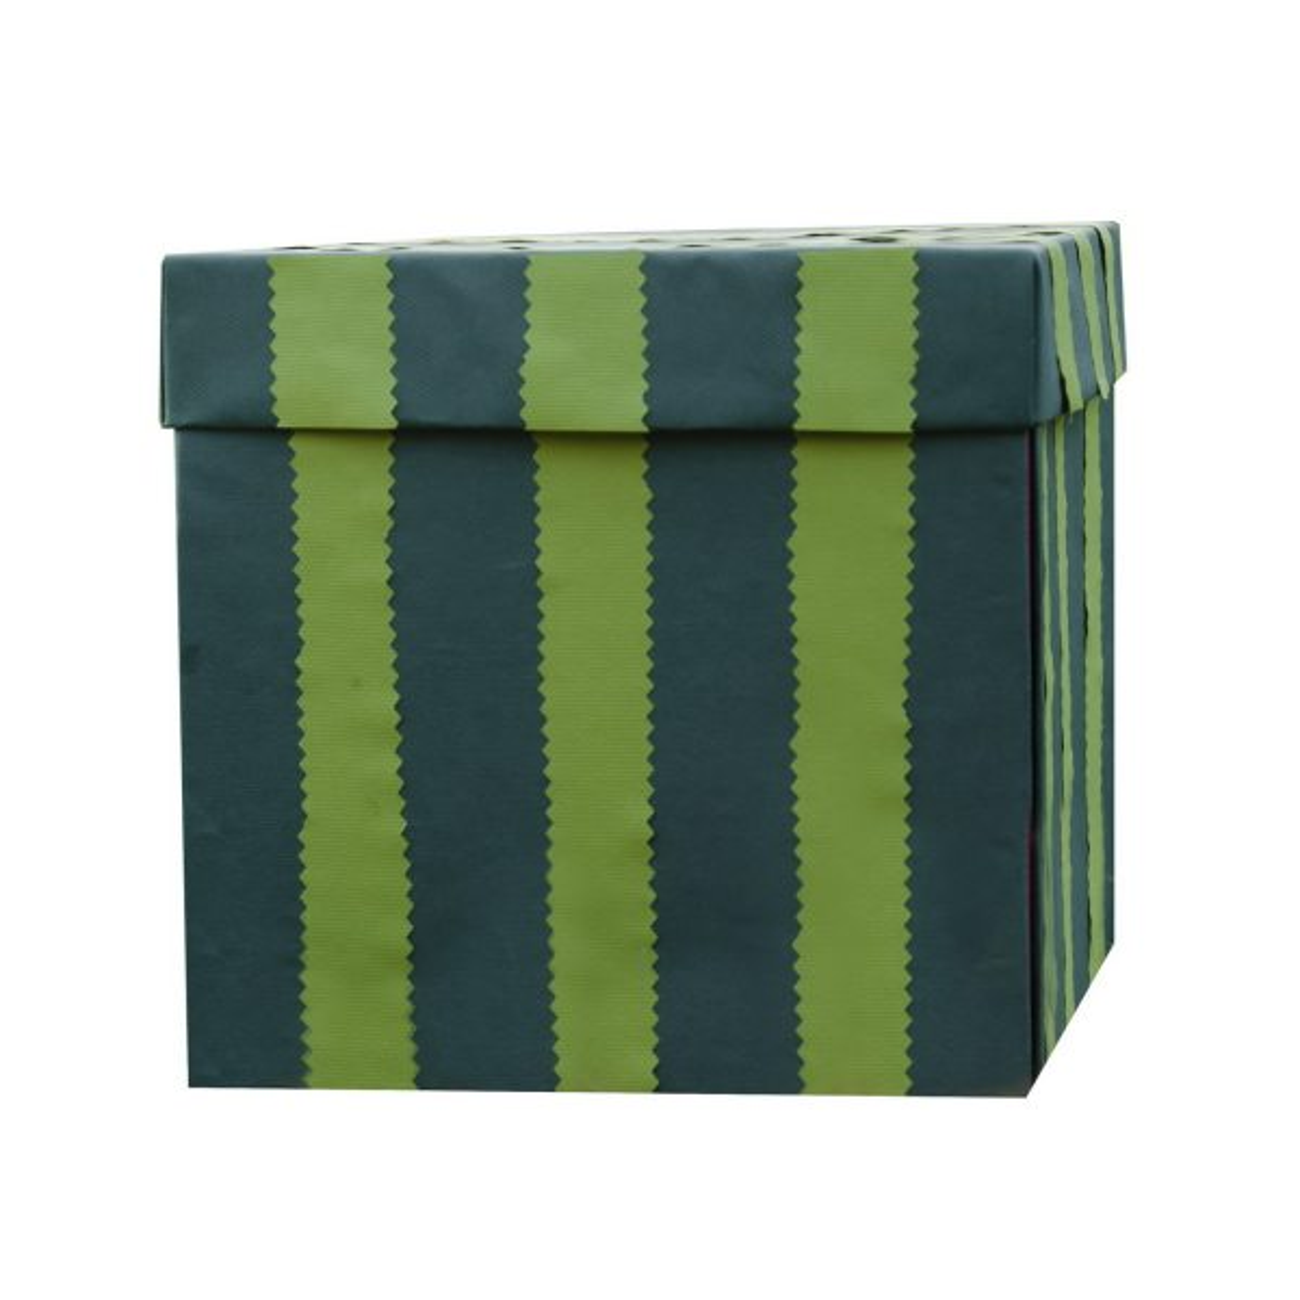 جعبه هدیه مدل آلبوم عکس کد یلدا